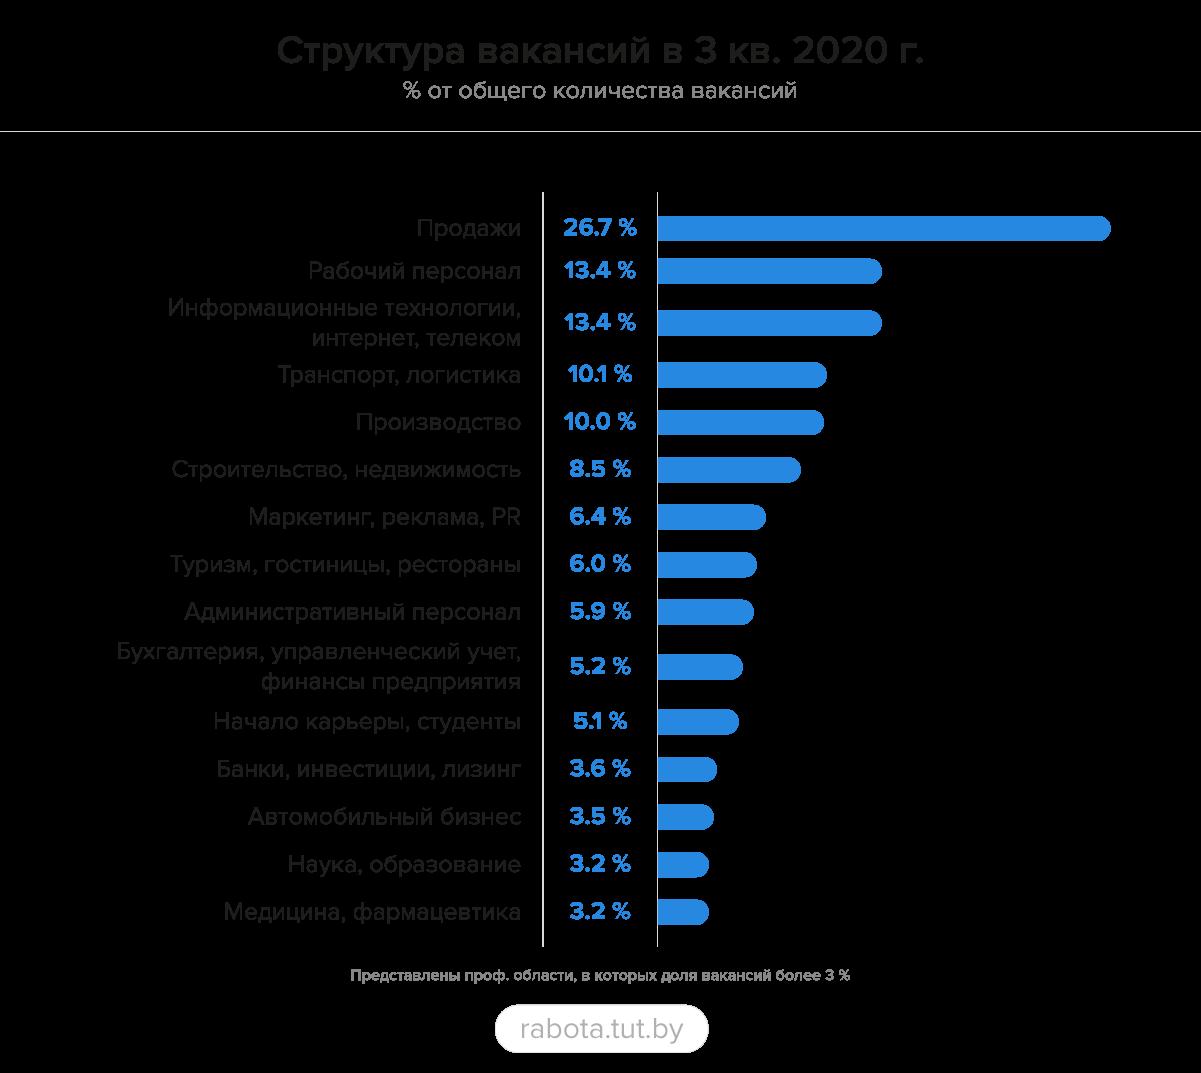 Аналитика рынка труда в 3-м квартале: рост количества вакансий и снижение конкуренции